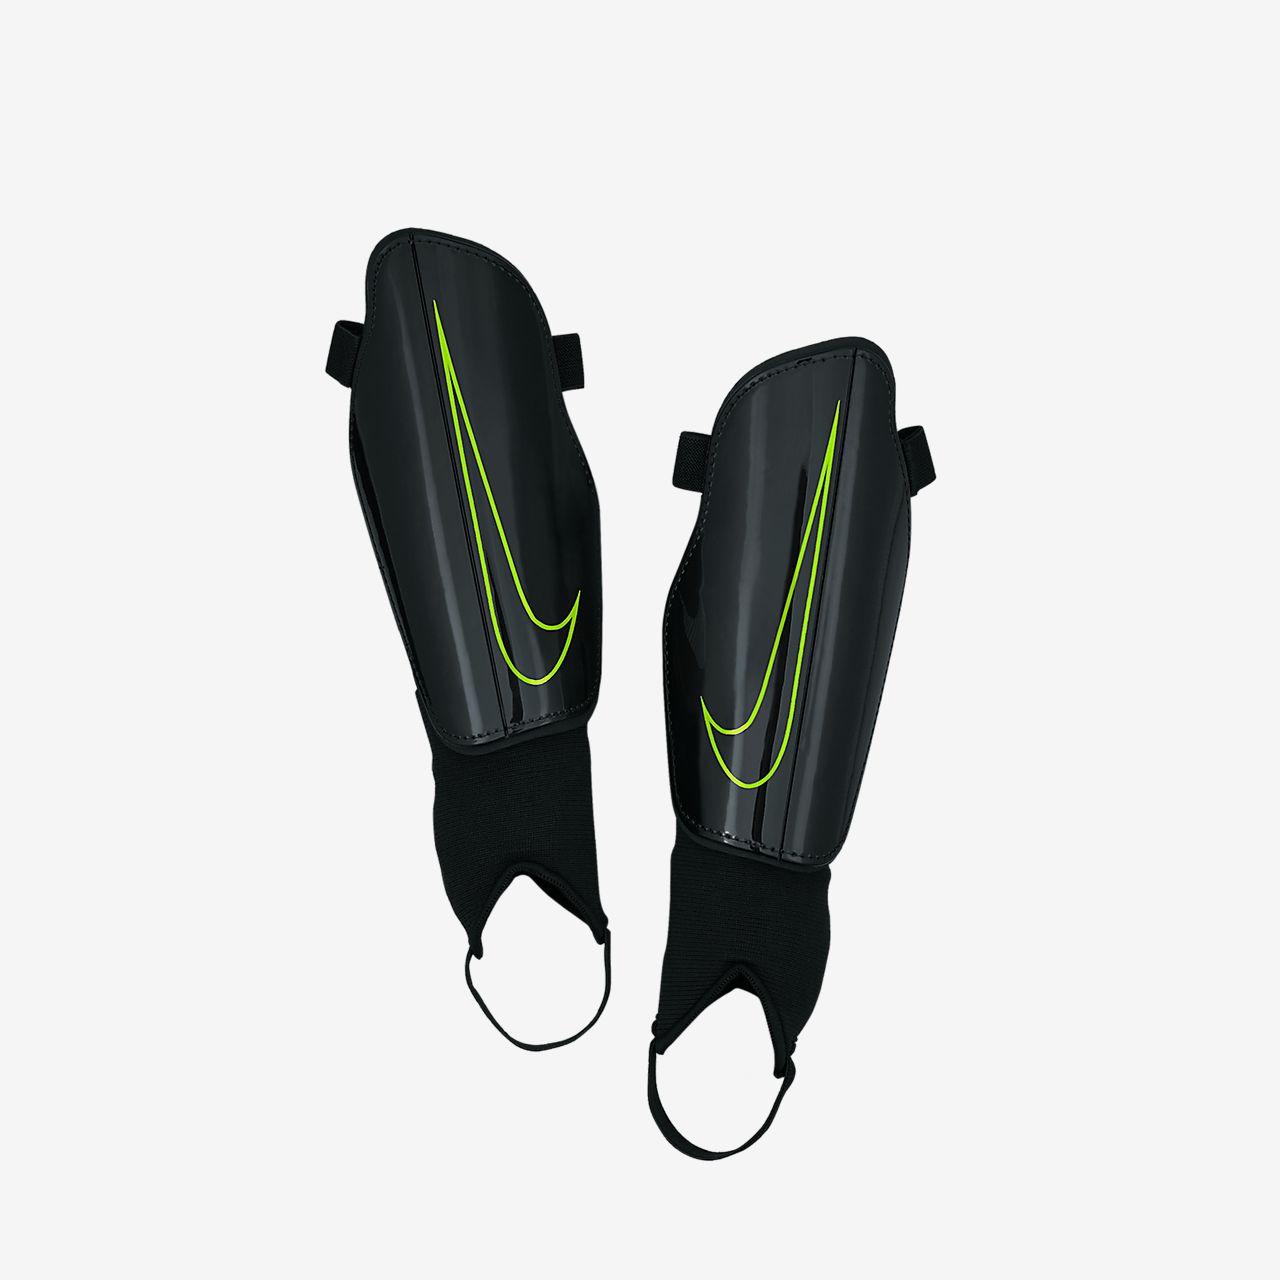 Nike Charge 2.0 fotballeggskinn